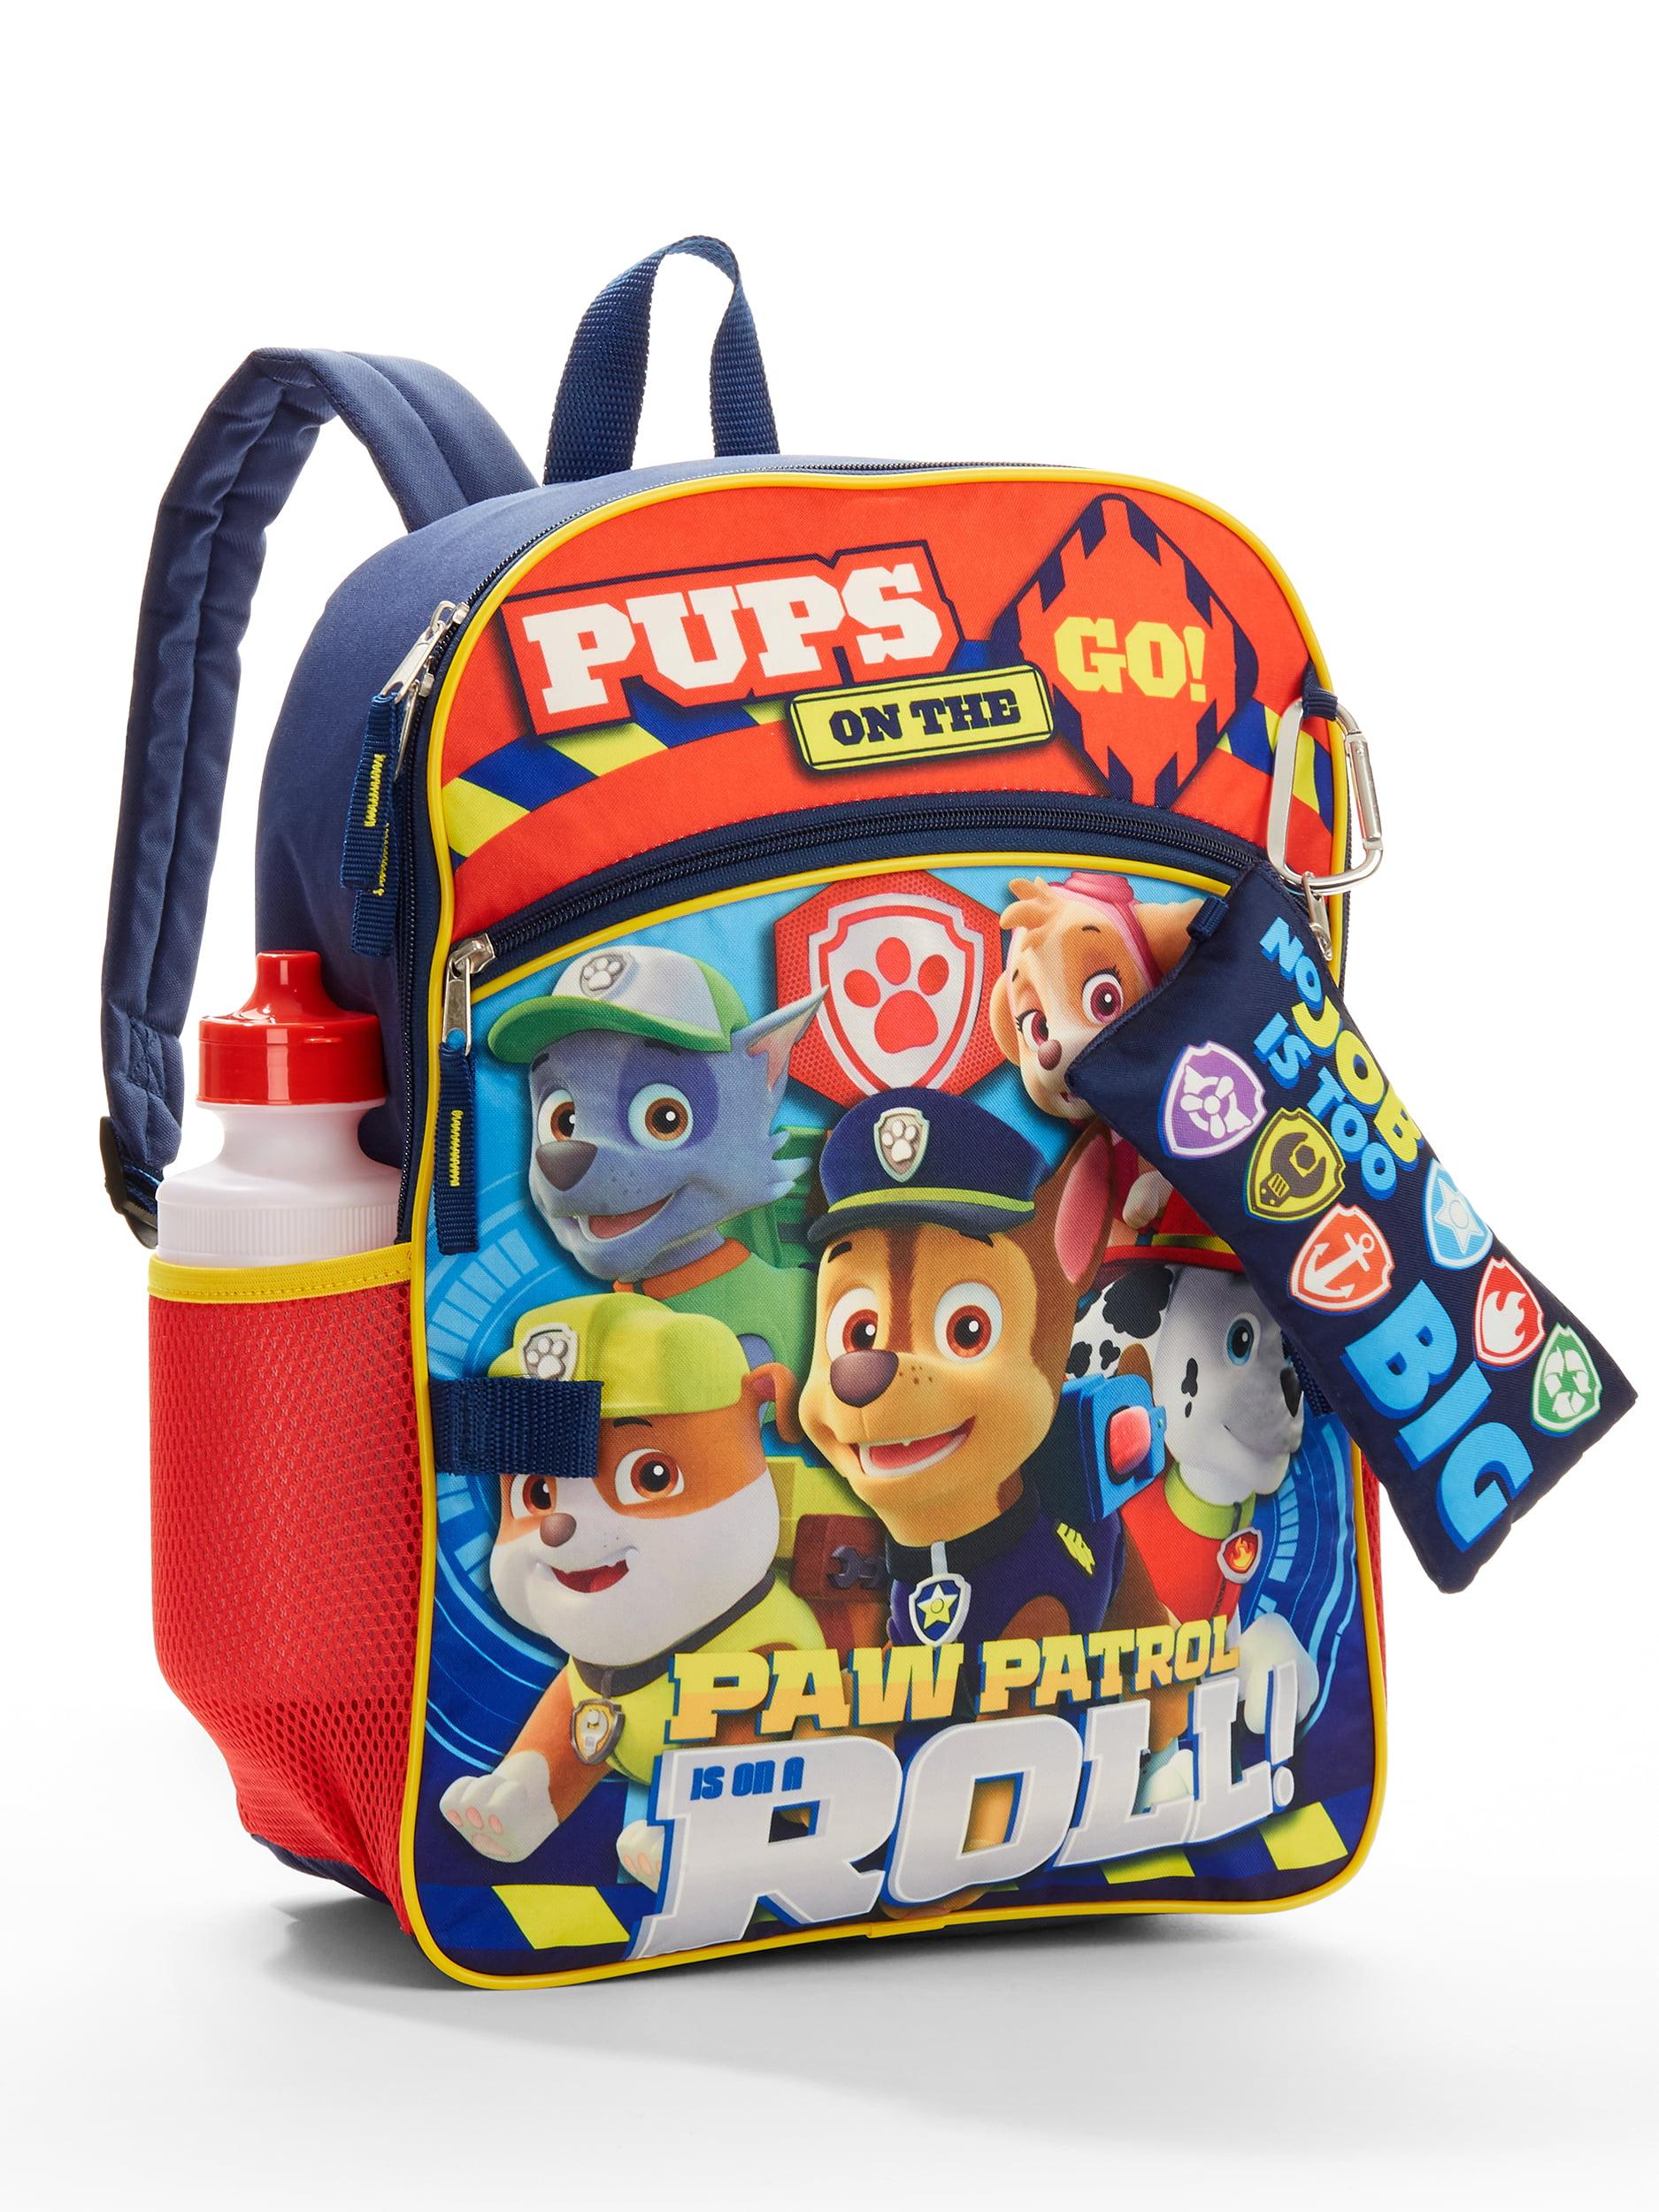 4ea4cdc1ba PAW Patrol - Paw Patrol 5 Piece Backpack Set - Walmart.com